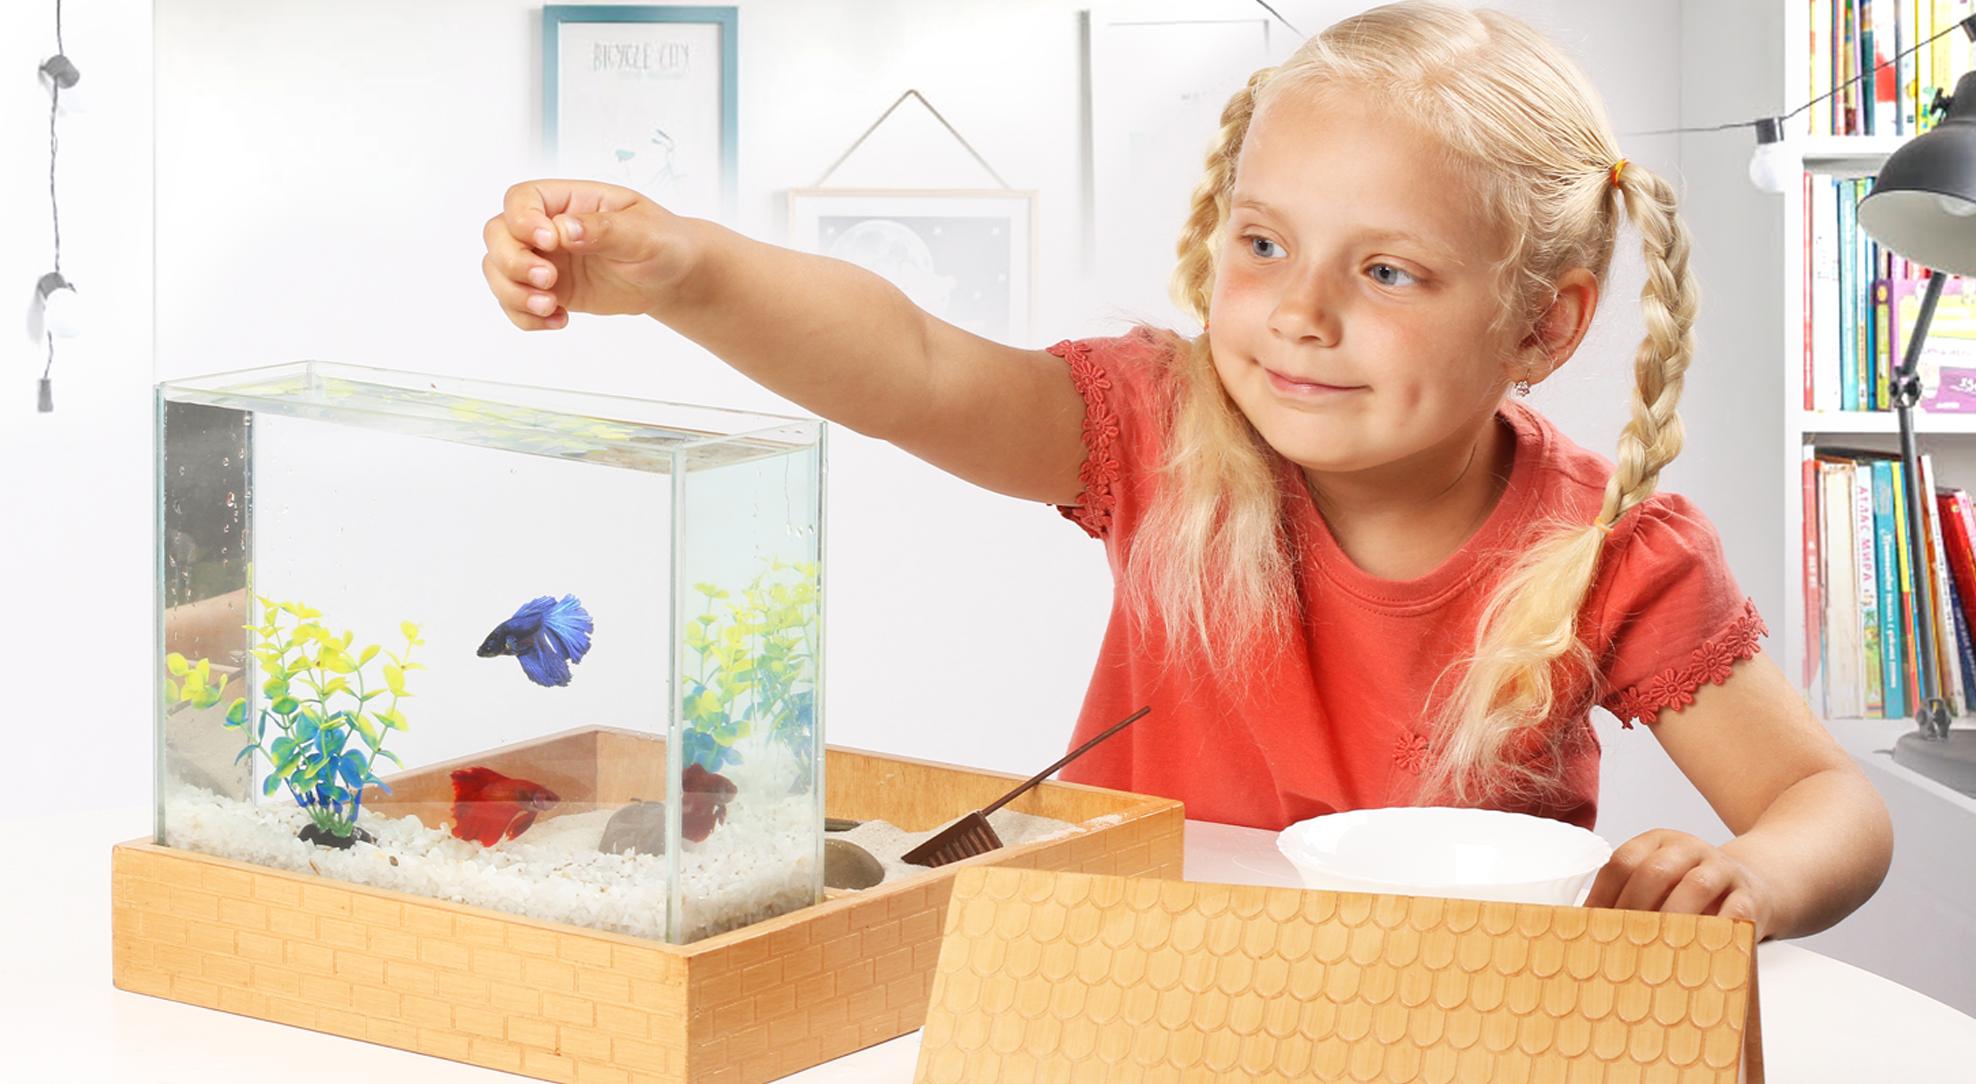 Мини аквариумы - плюсы и минусы.